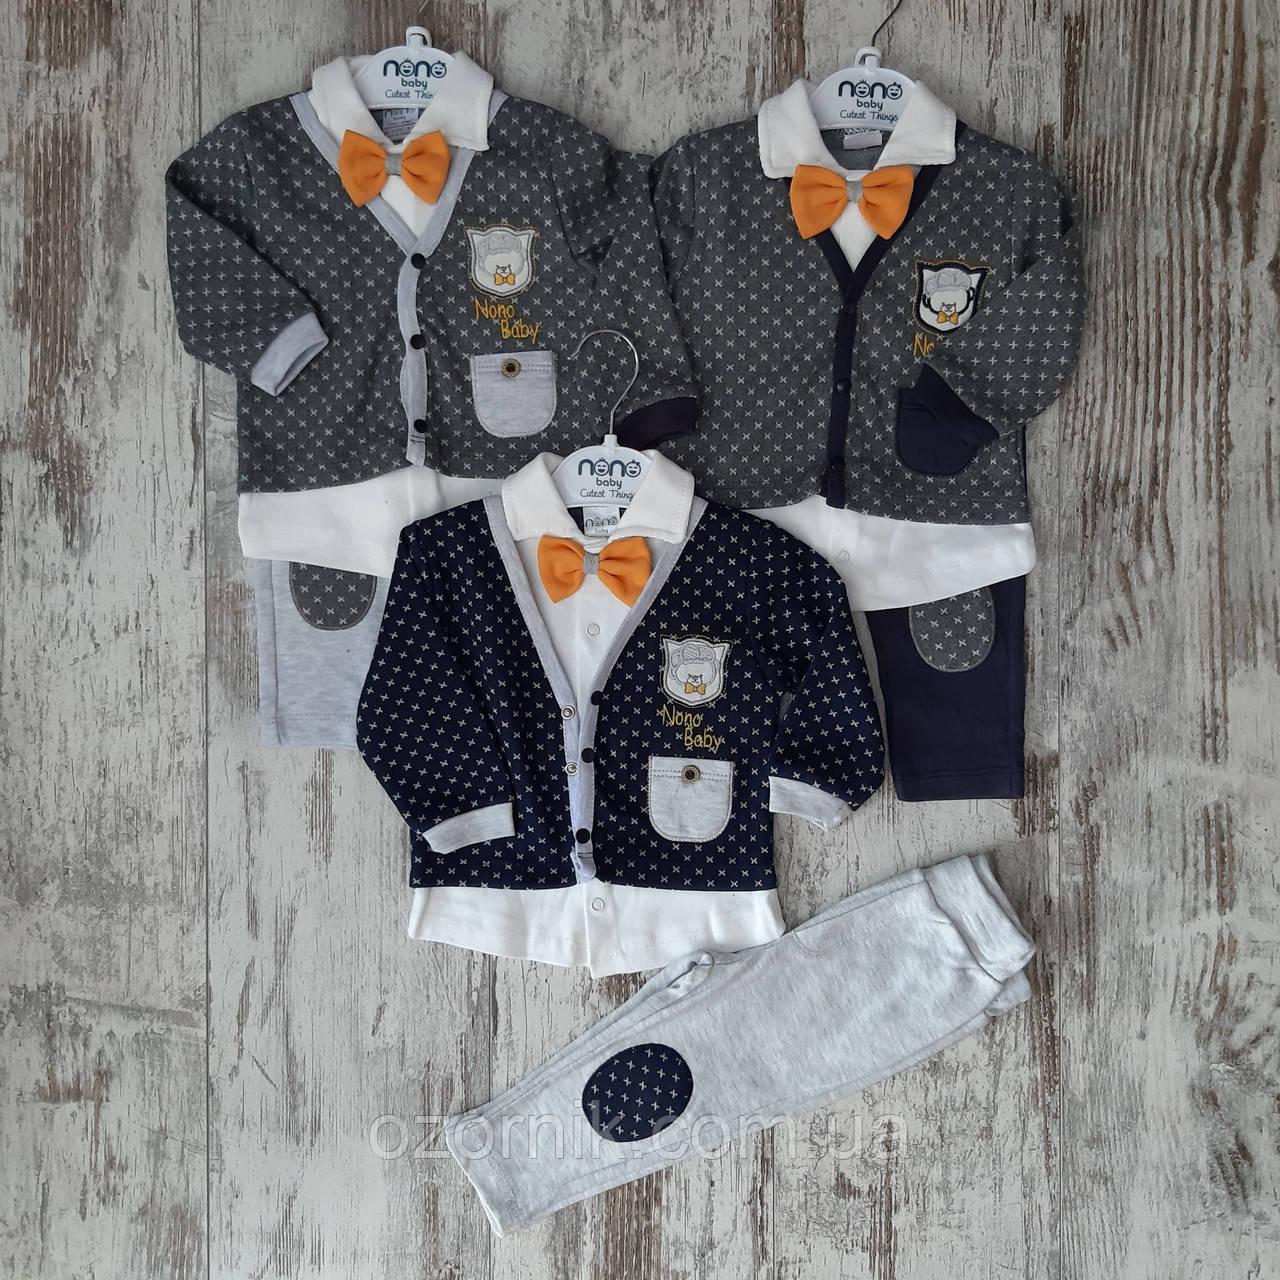 костюм джентльмен для малышей